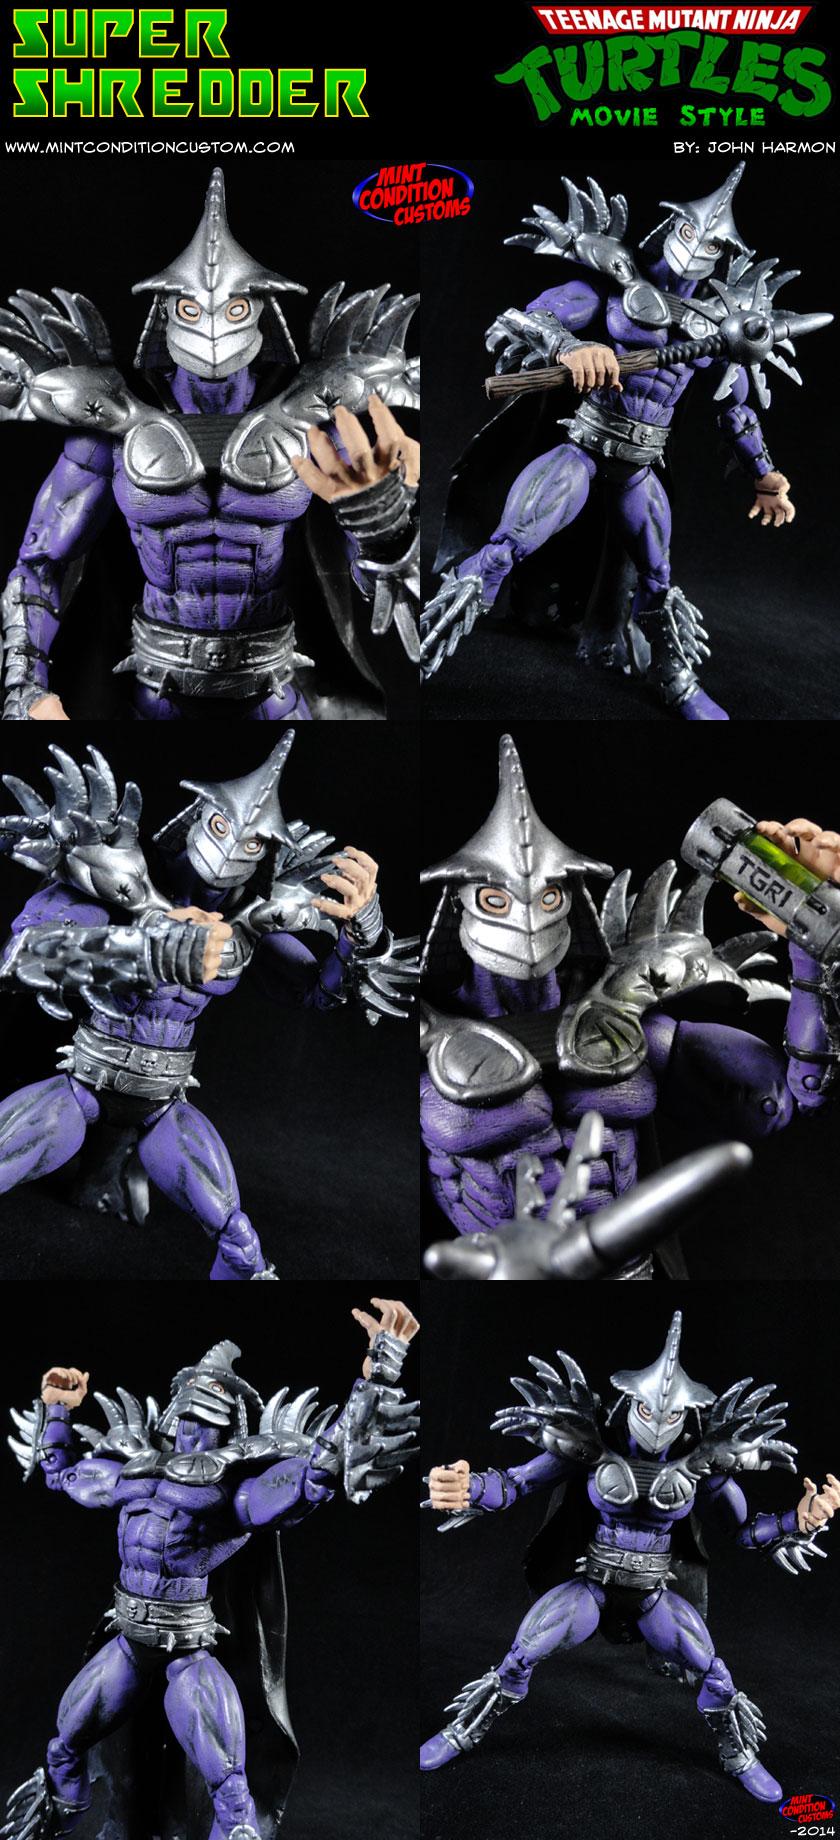 Custom Super Shredder Movie Style Action Figure By